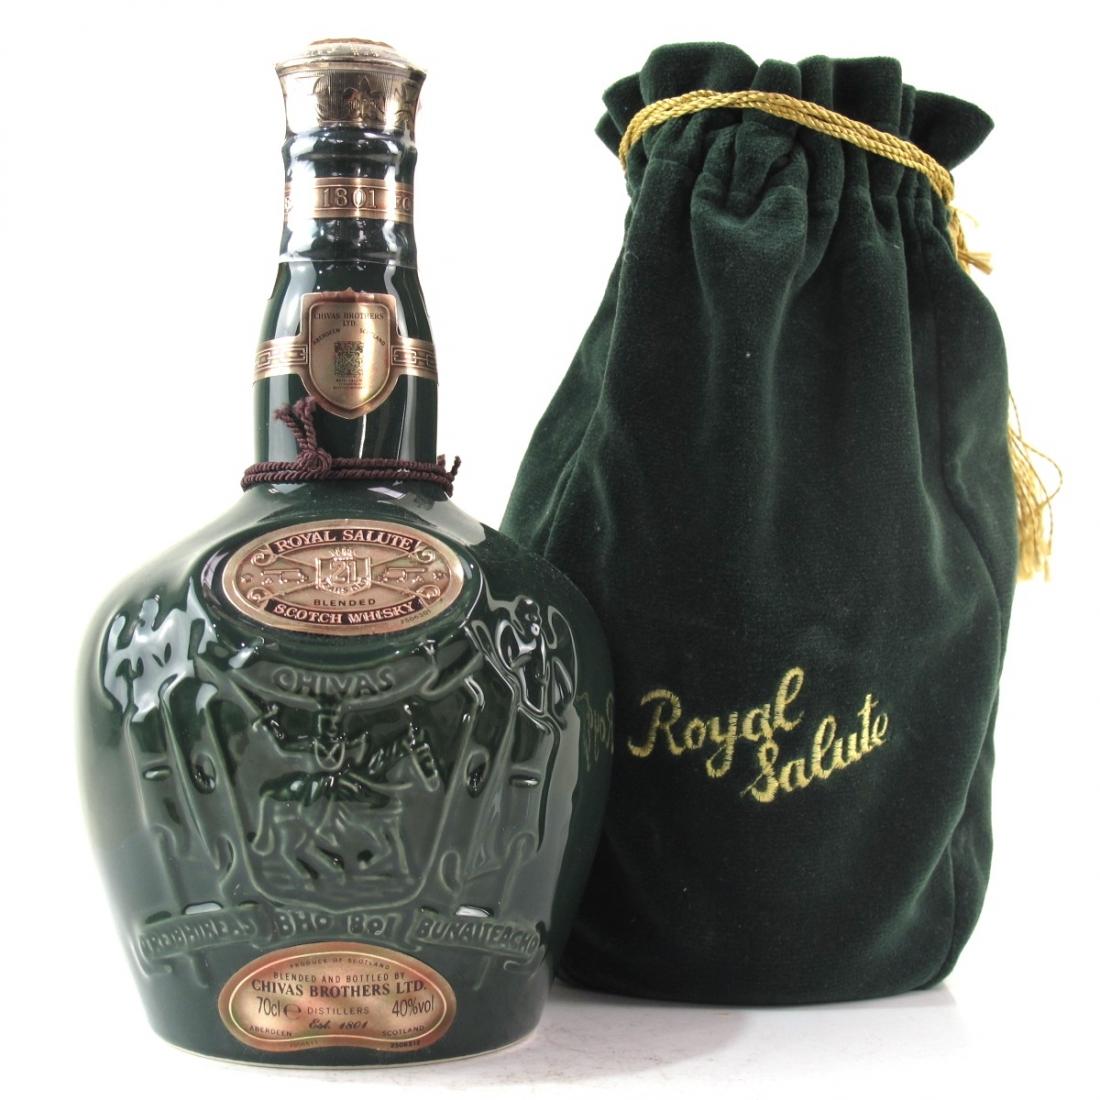 Chivas 21 Year Old Royal Salute / Emerald Flagon